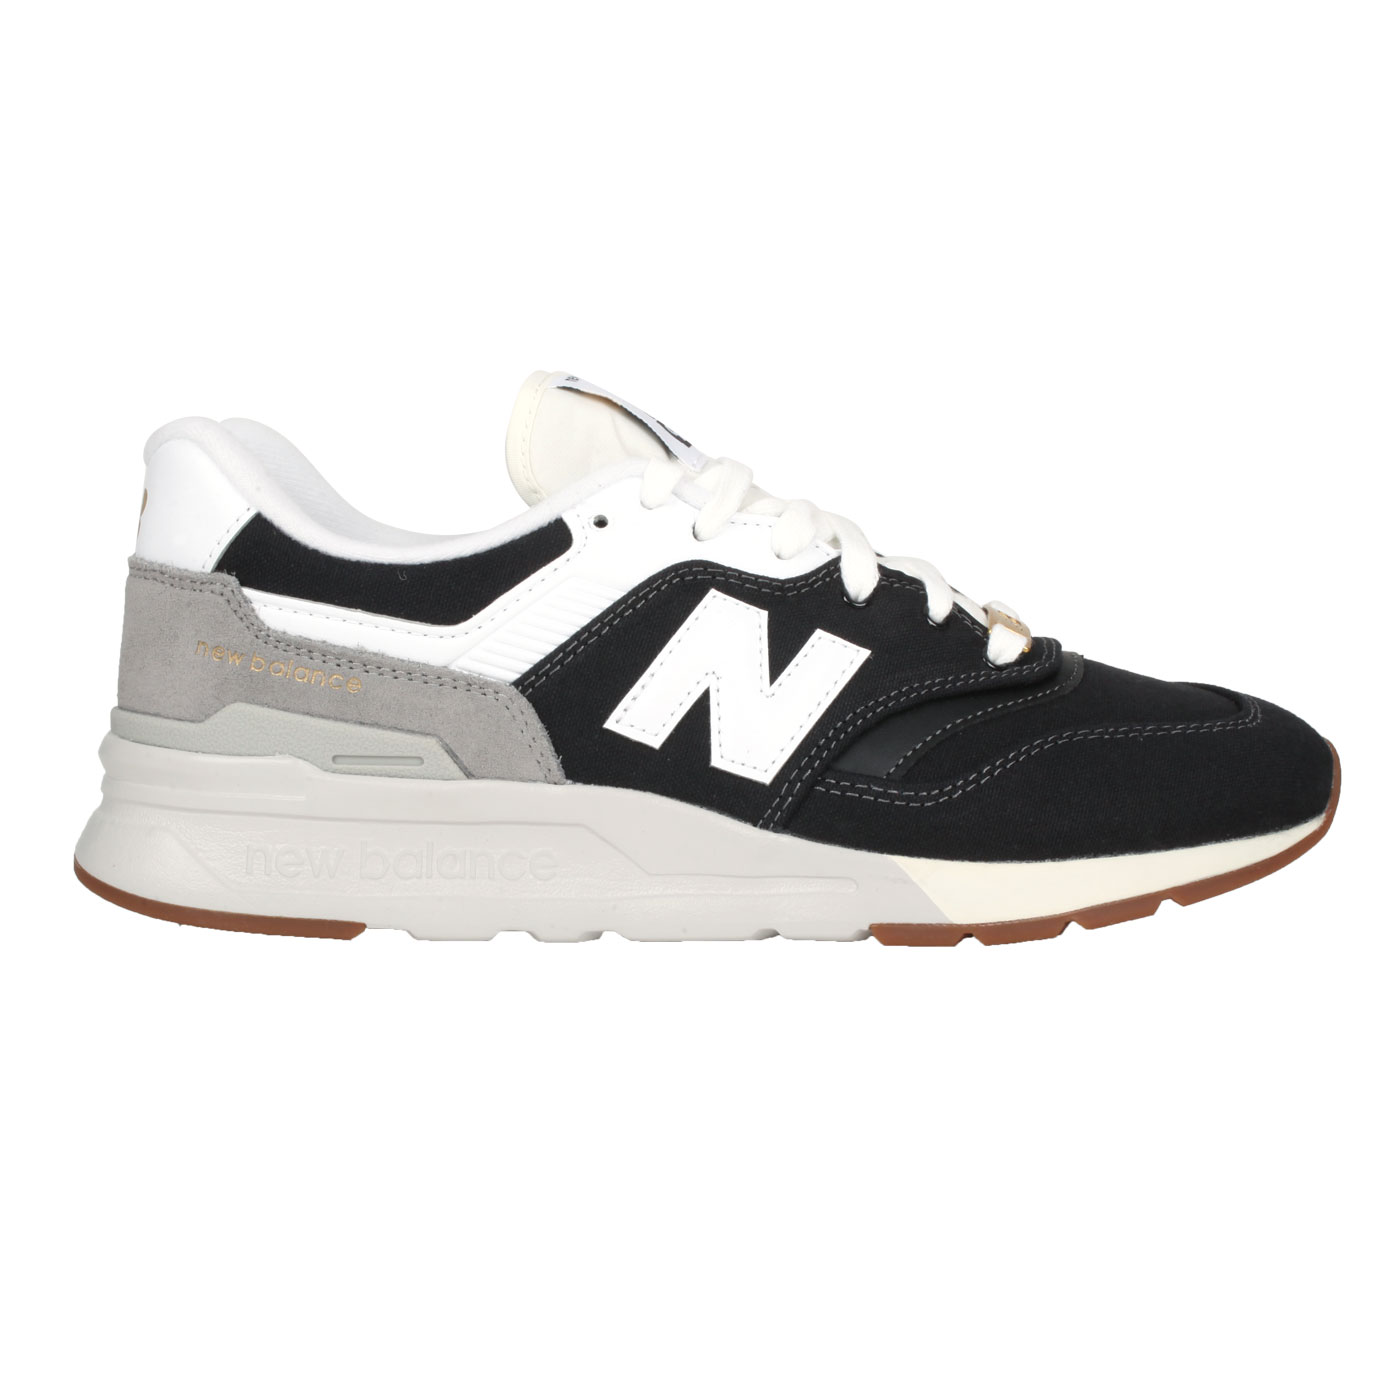 NEW BALANCE 男款復古運動鞋 CM997HHC - 黑白灰